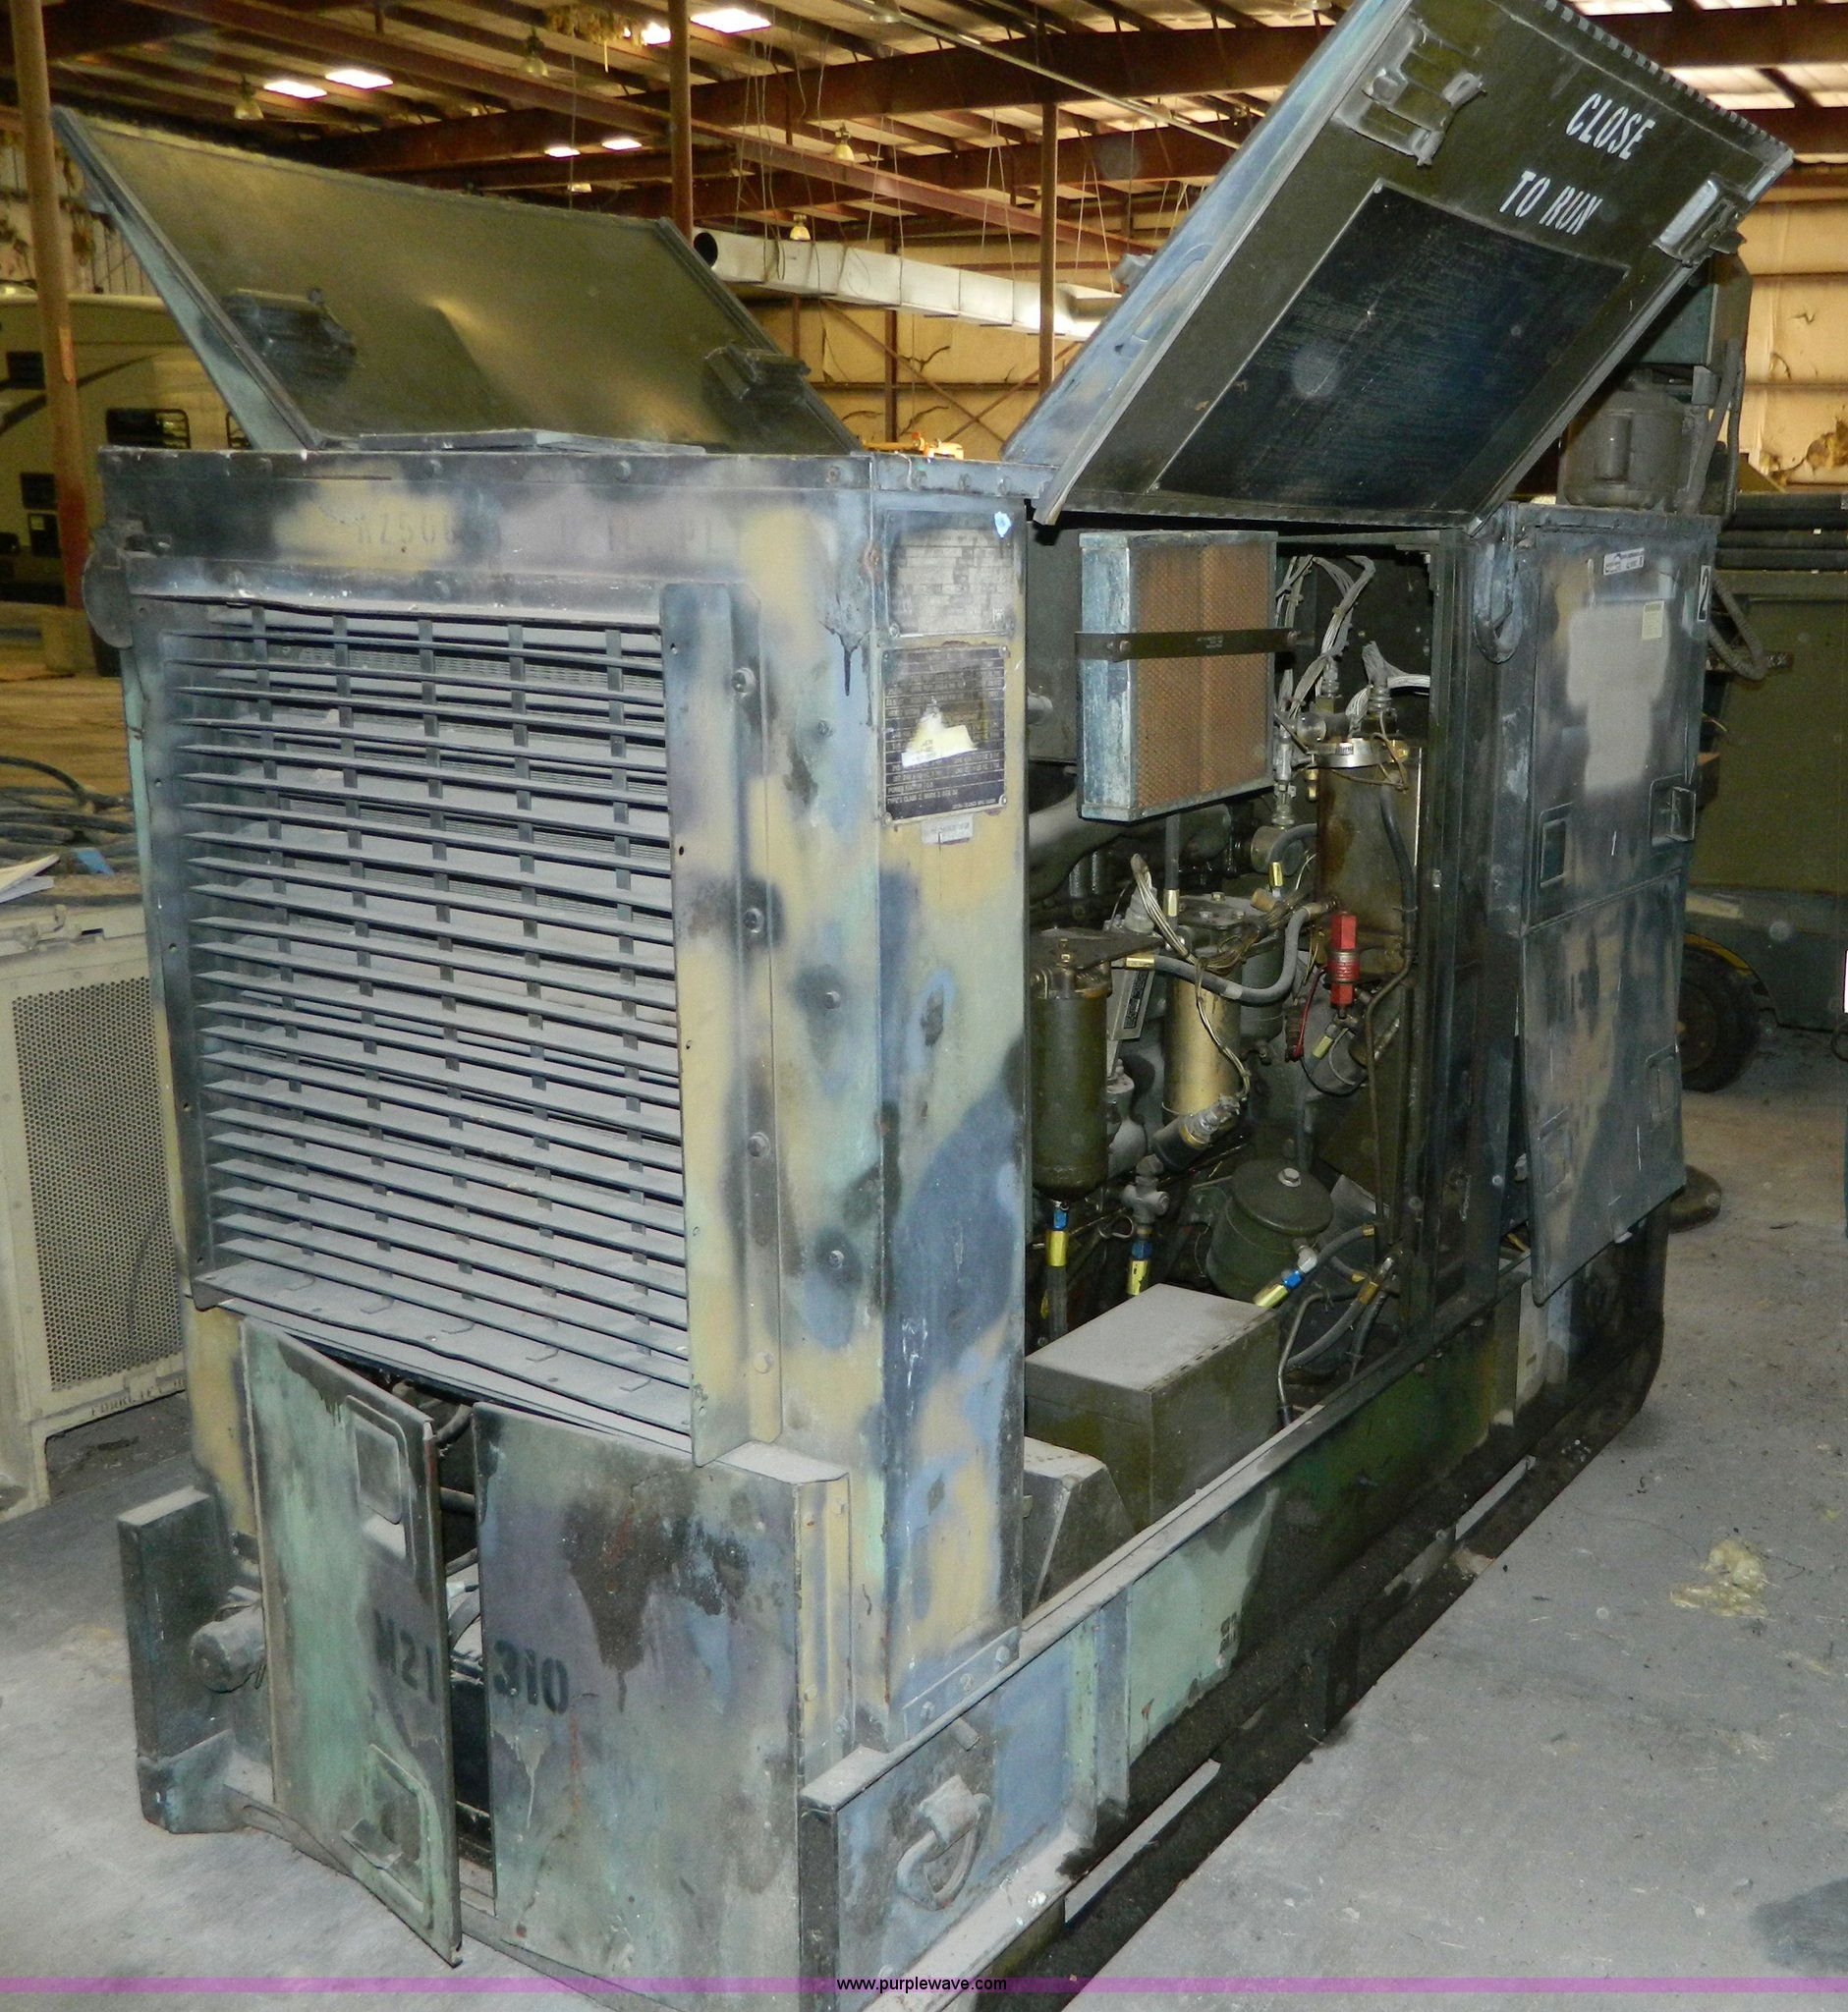 U S  Army Surplus portable generator | Item AZ9187 | SOLD! N